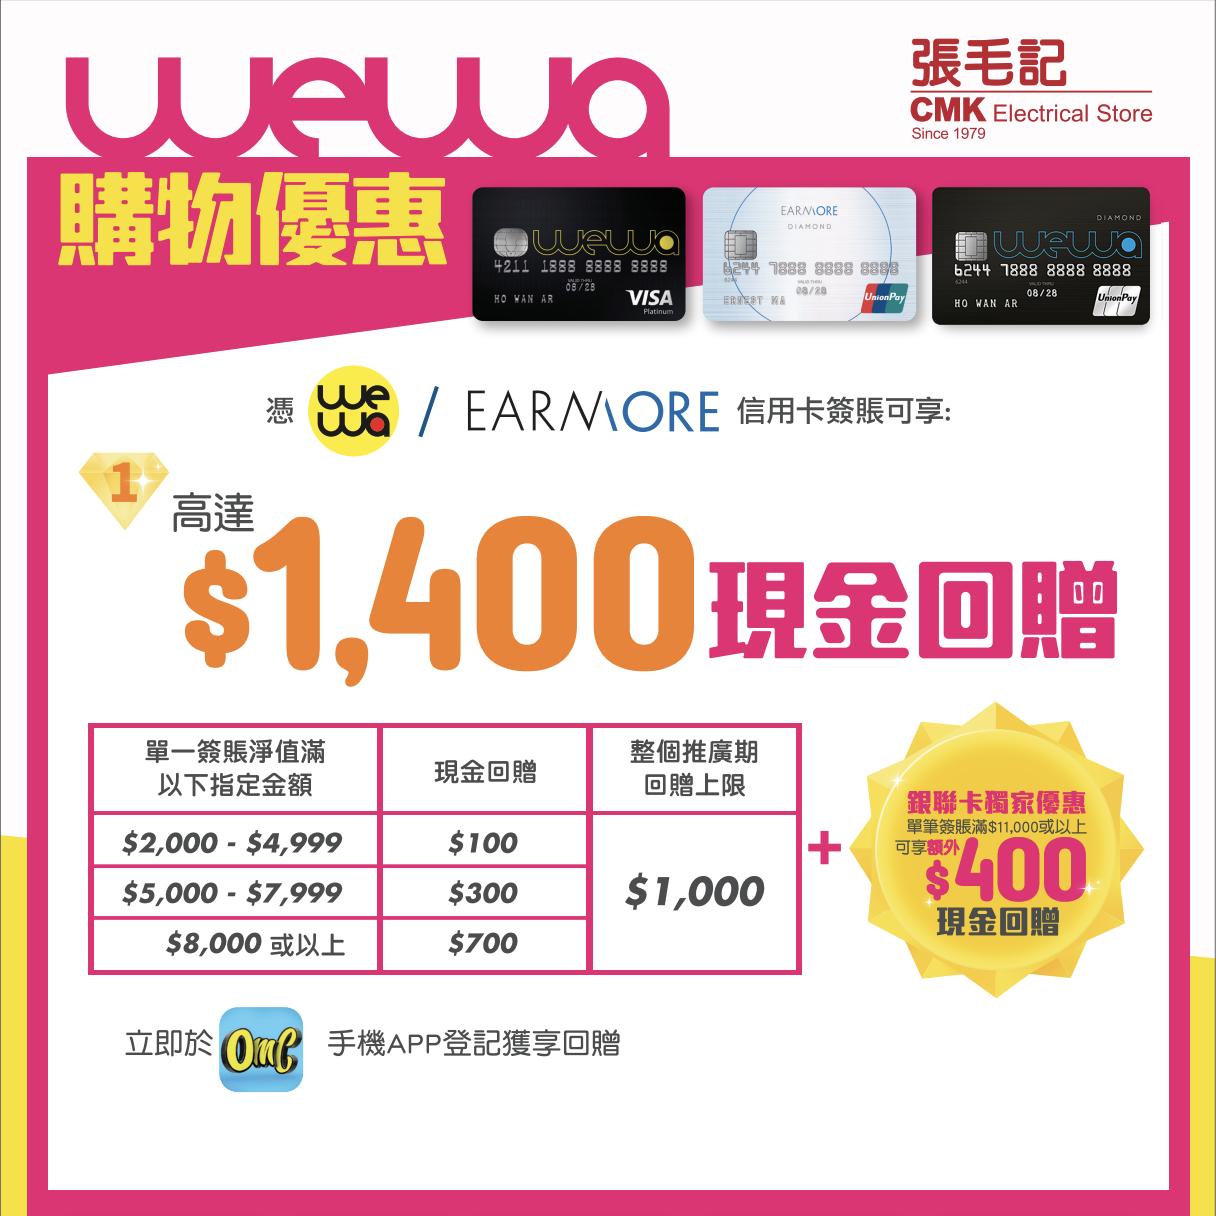 CMK x WeWa 購物優惠簽賬可享高達HK$1,400現金回贈!用安信WeWa銀聯 或 安信Earnmore銀聯買$11,000回贈高達$1,320!食埋迎新最高仲有$2,520現金回贈!